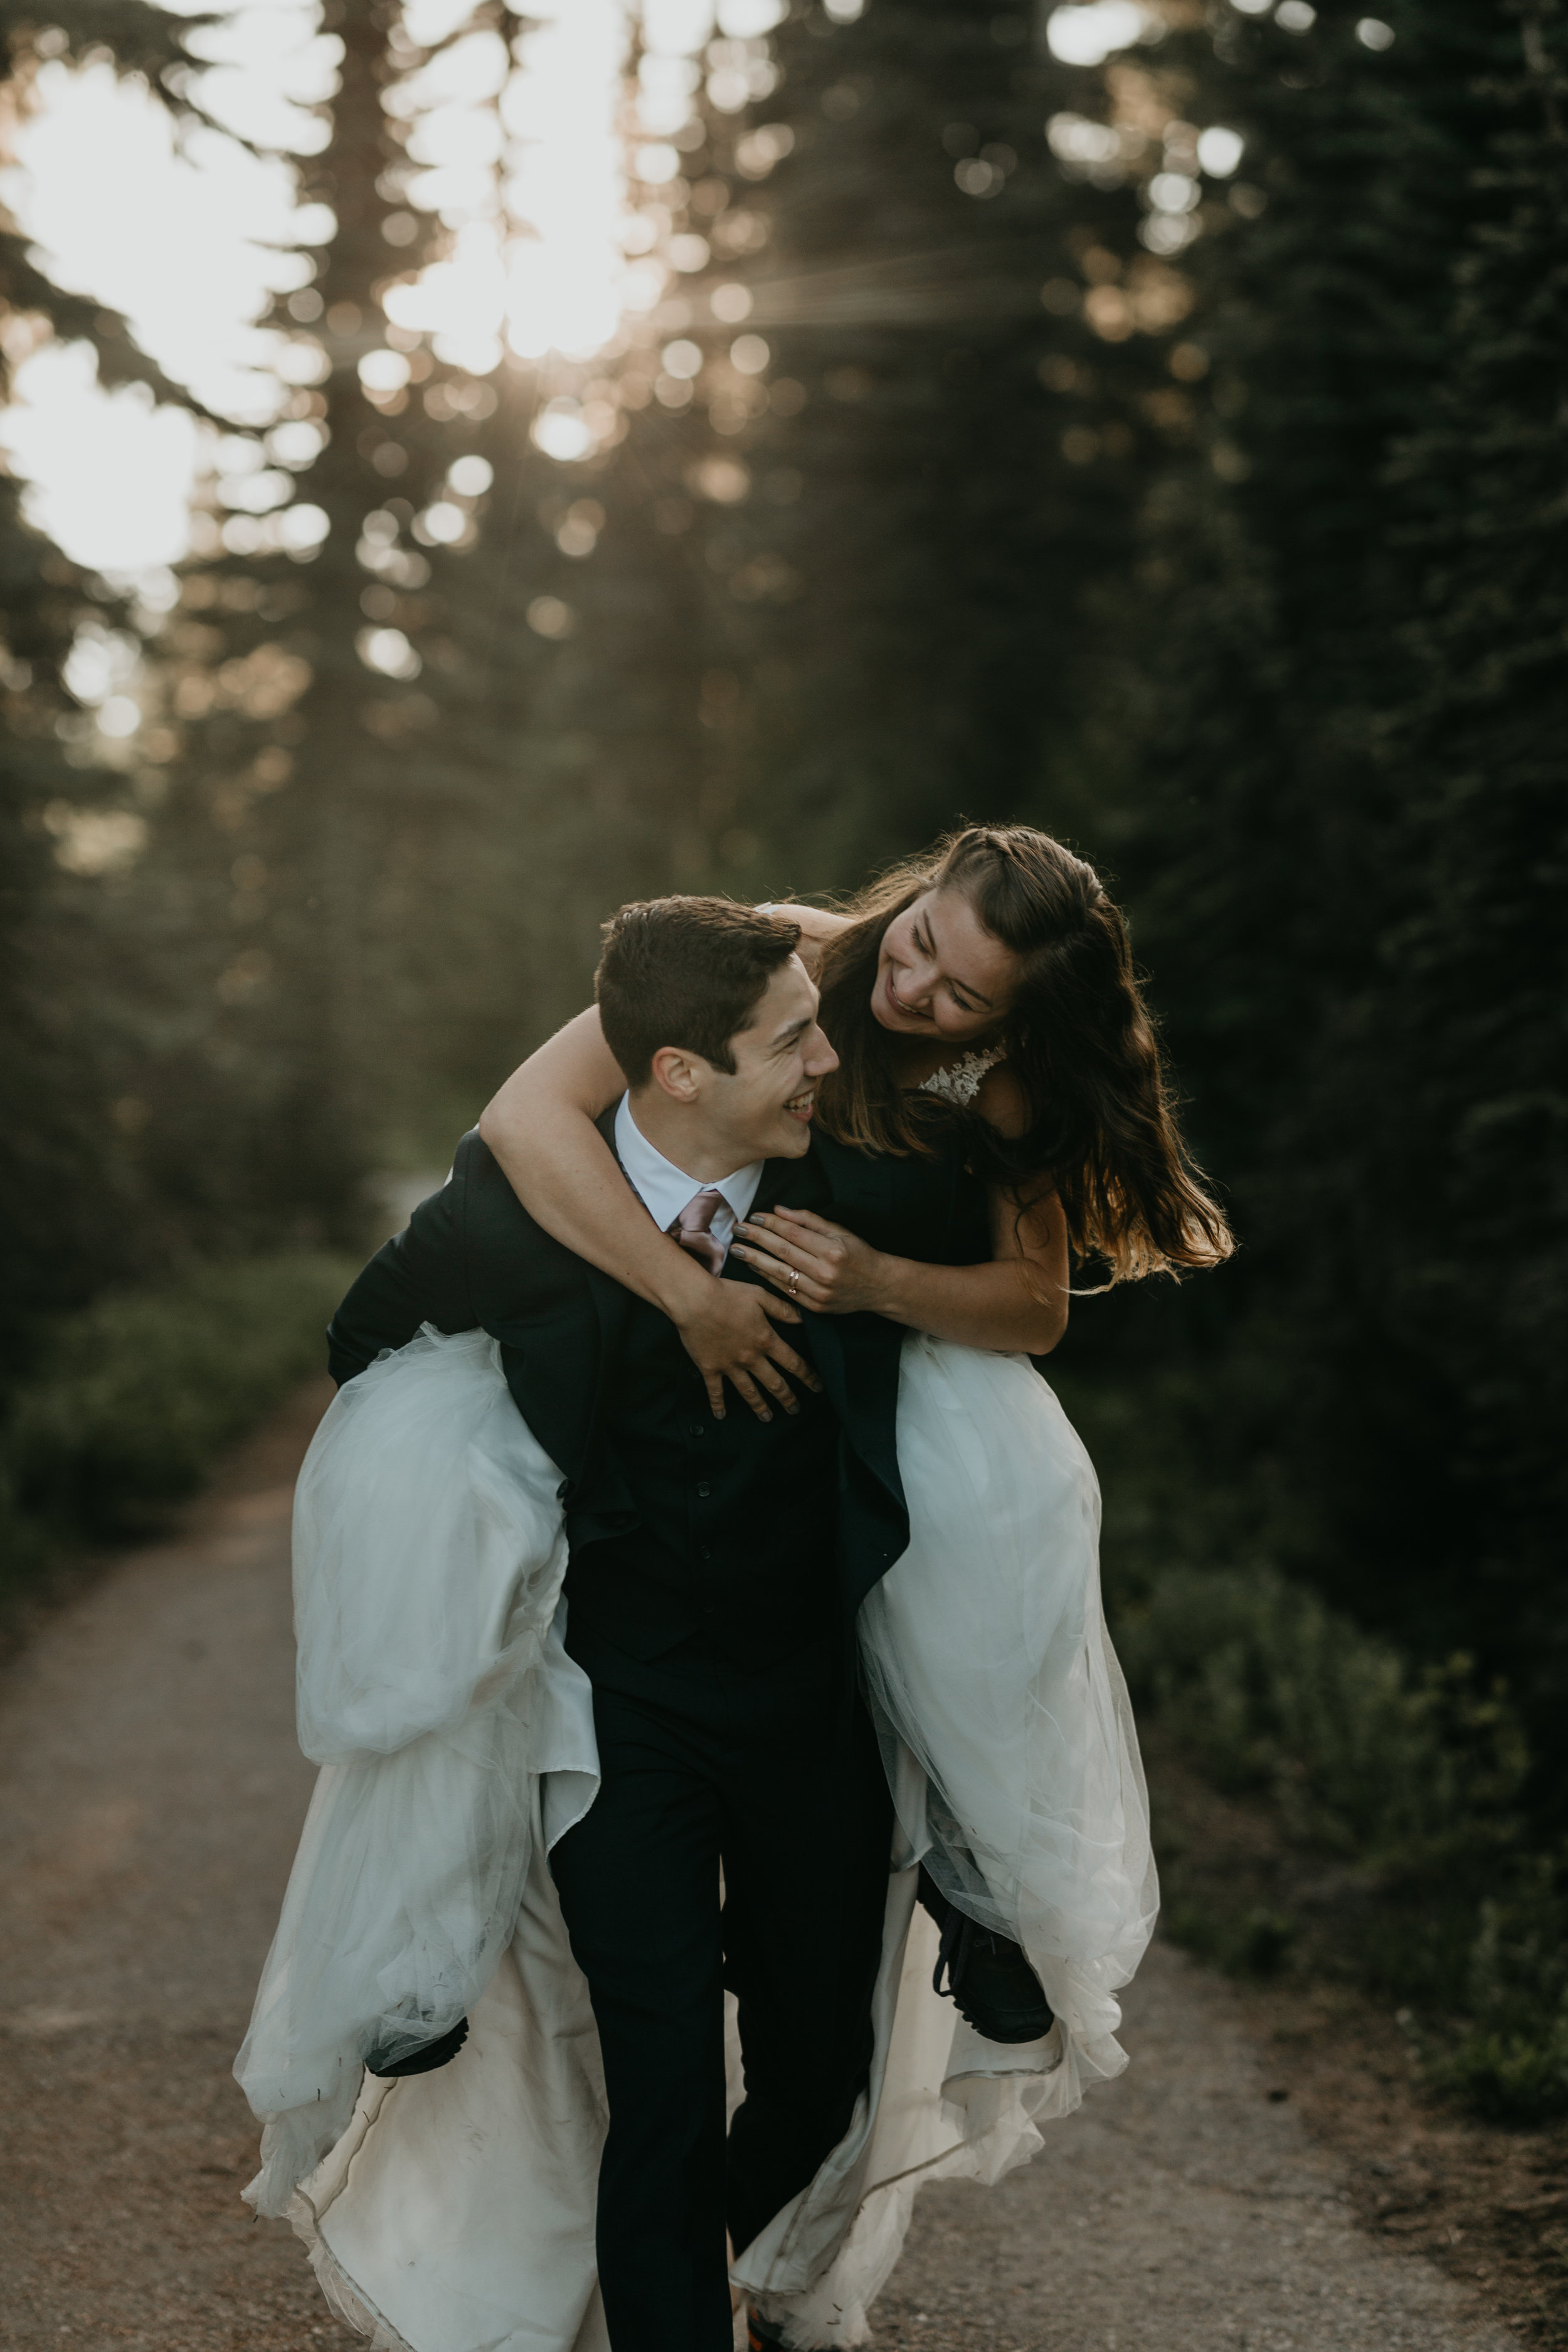 Nicole-Daacke-Photography-Mt-Rainier-elopement-photographer-washington-mountain-epic-wedding-photography-wildflowers-at-rainier-pine-tree-cloudy-summer-day-at-mountain-rainier-30.jpg